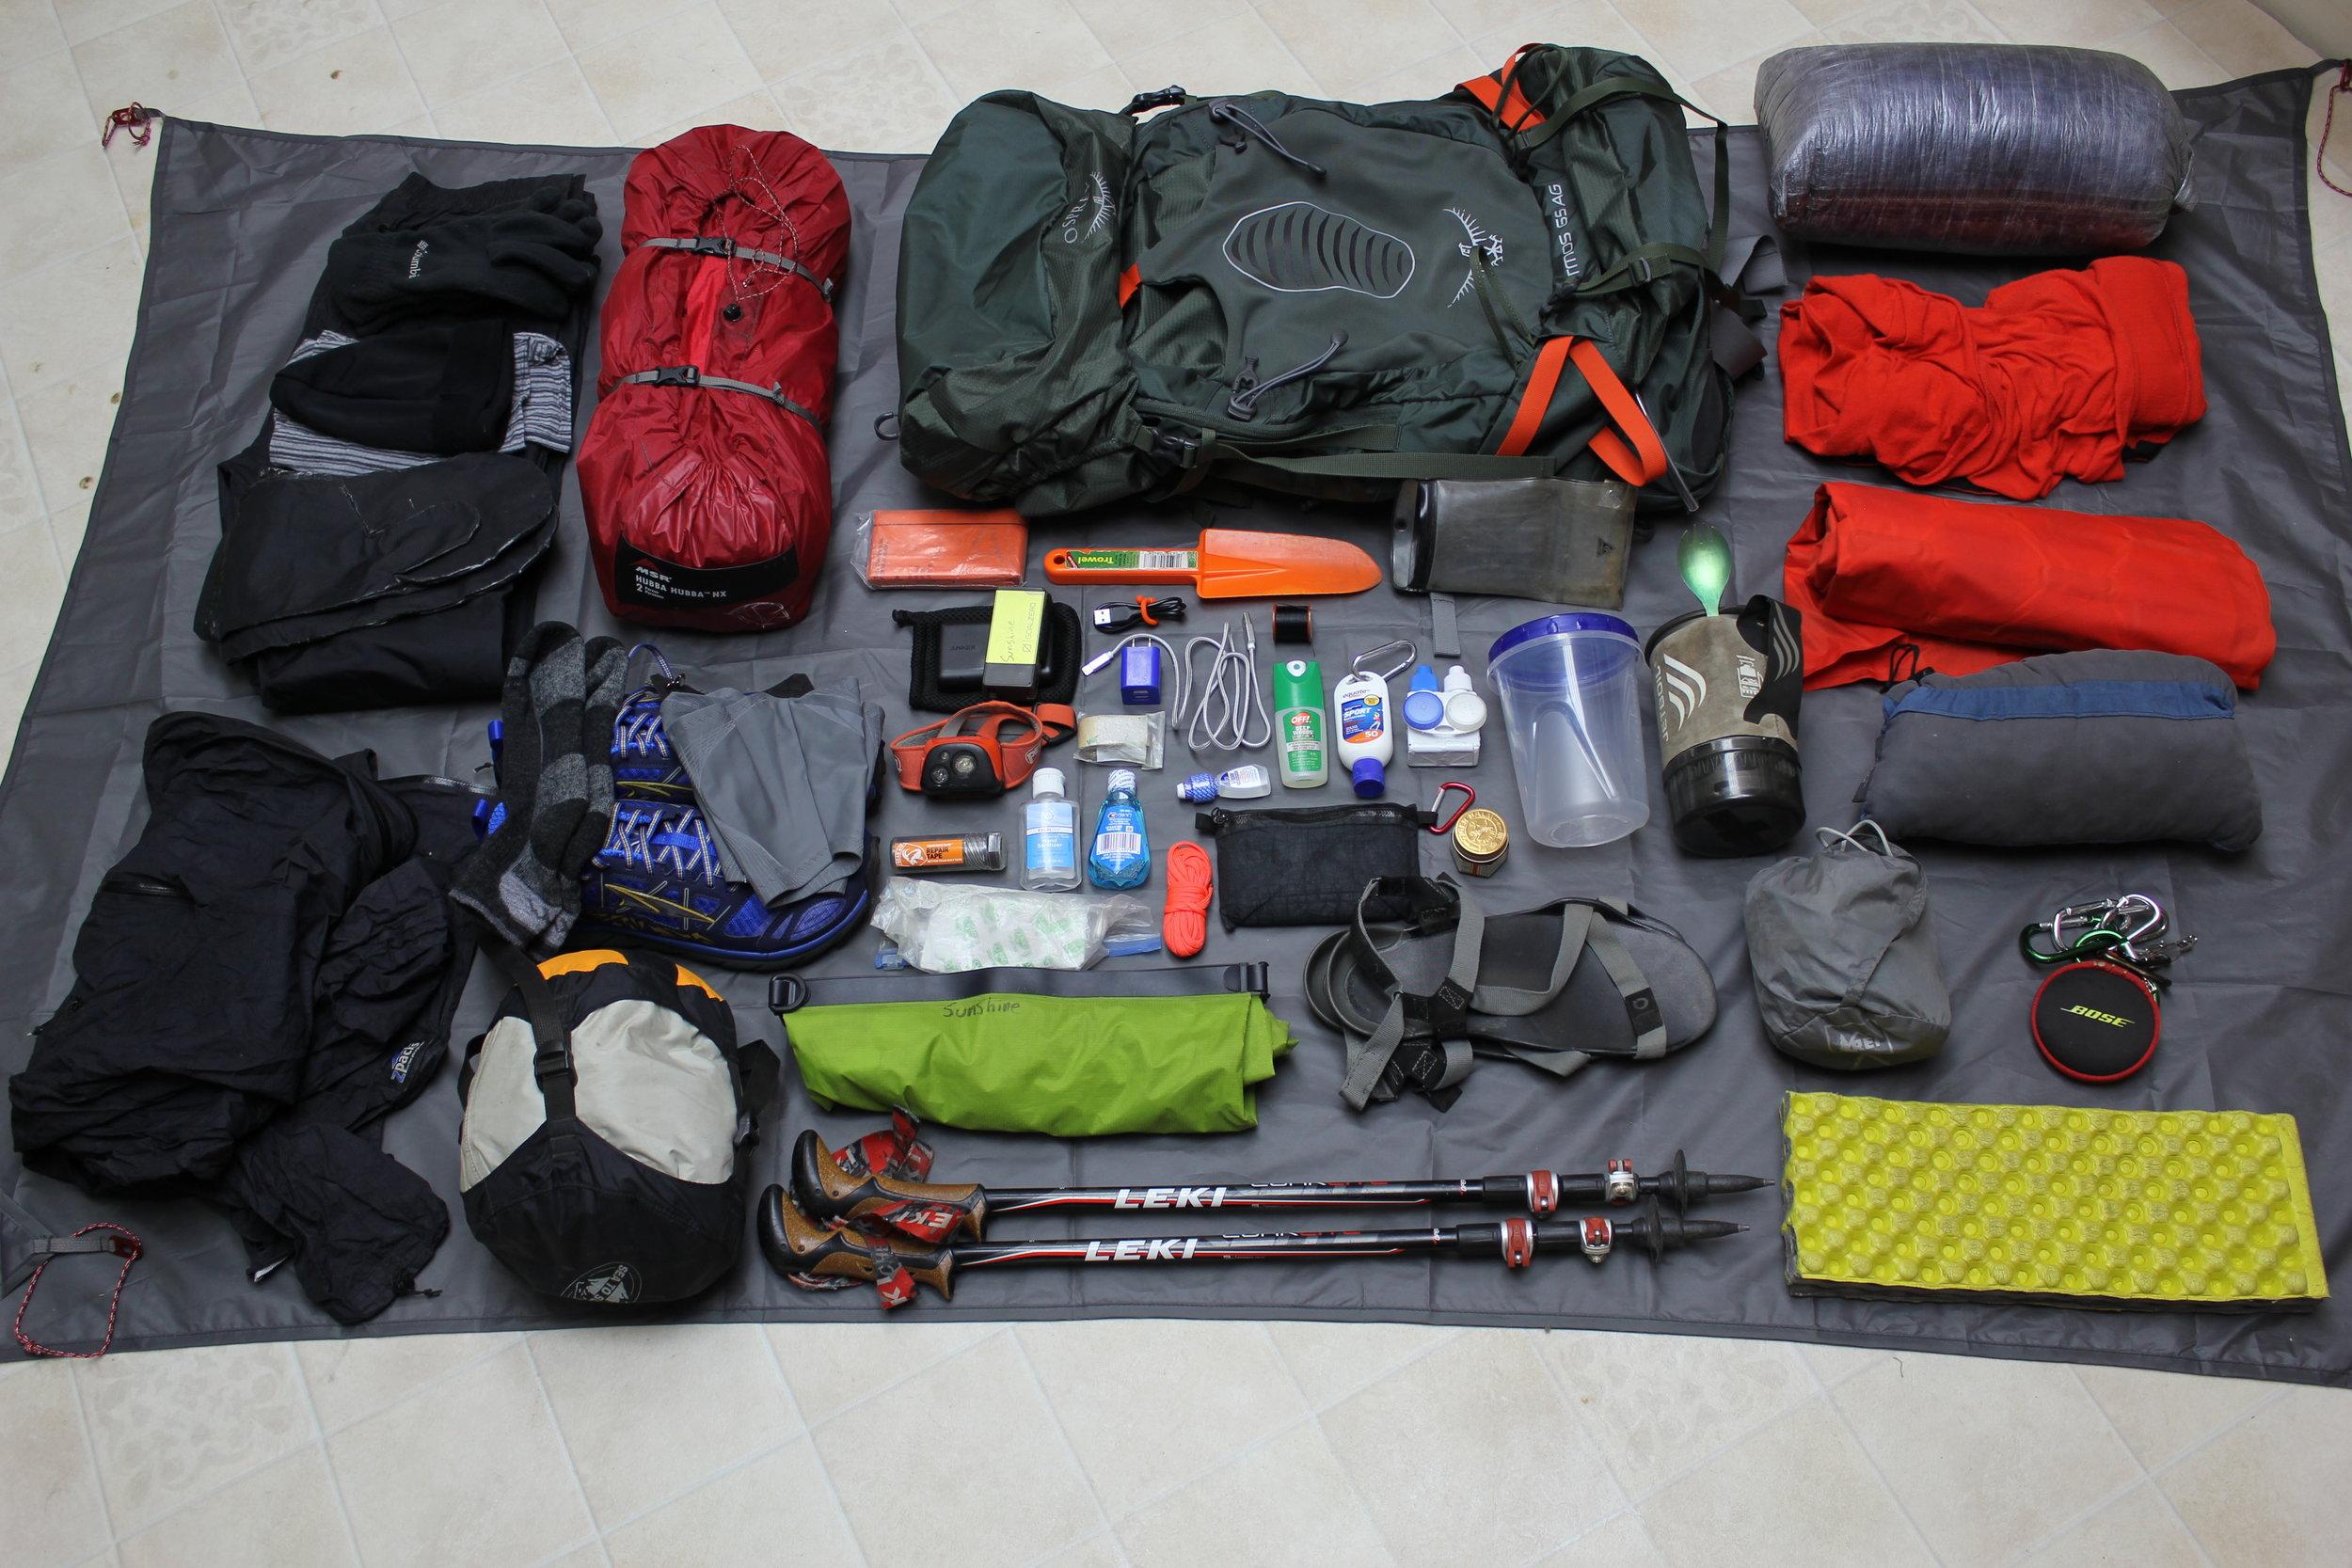 Appalachian Trail Gear 004.JPG